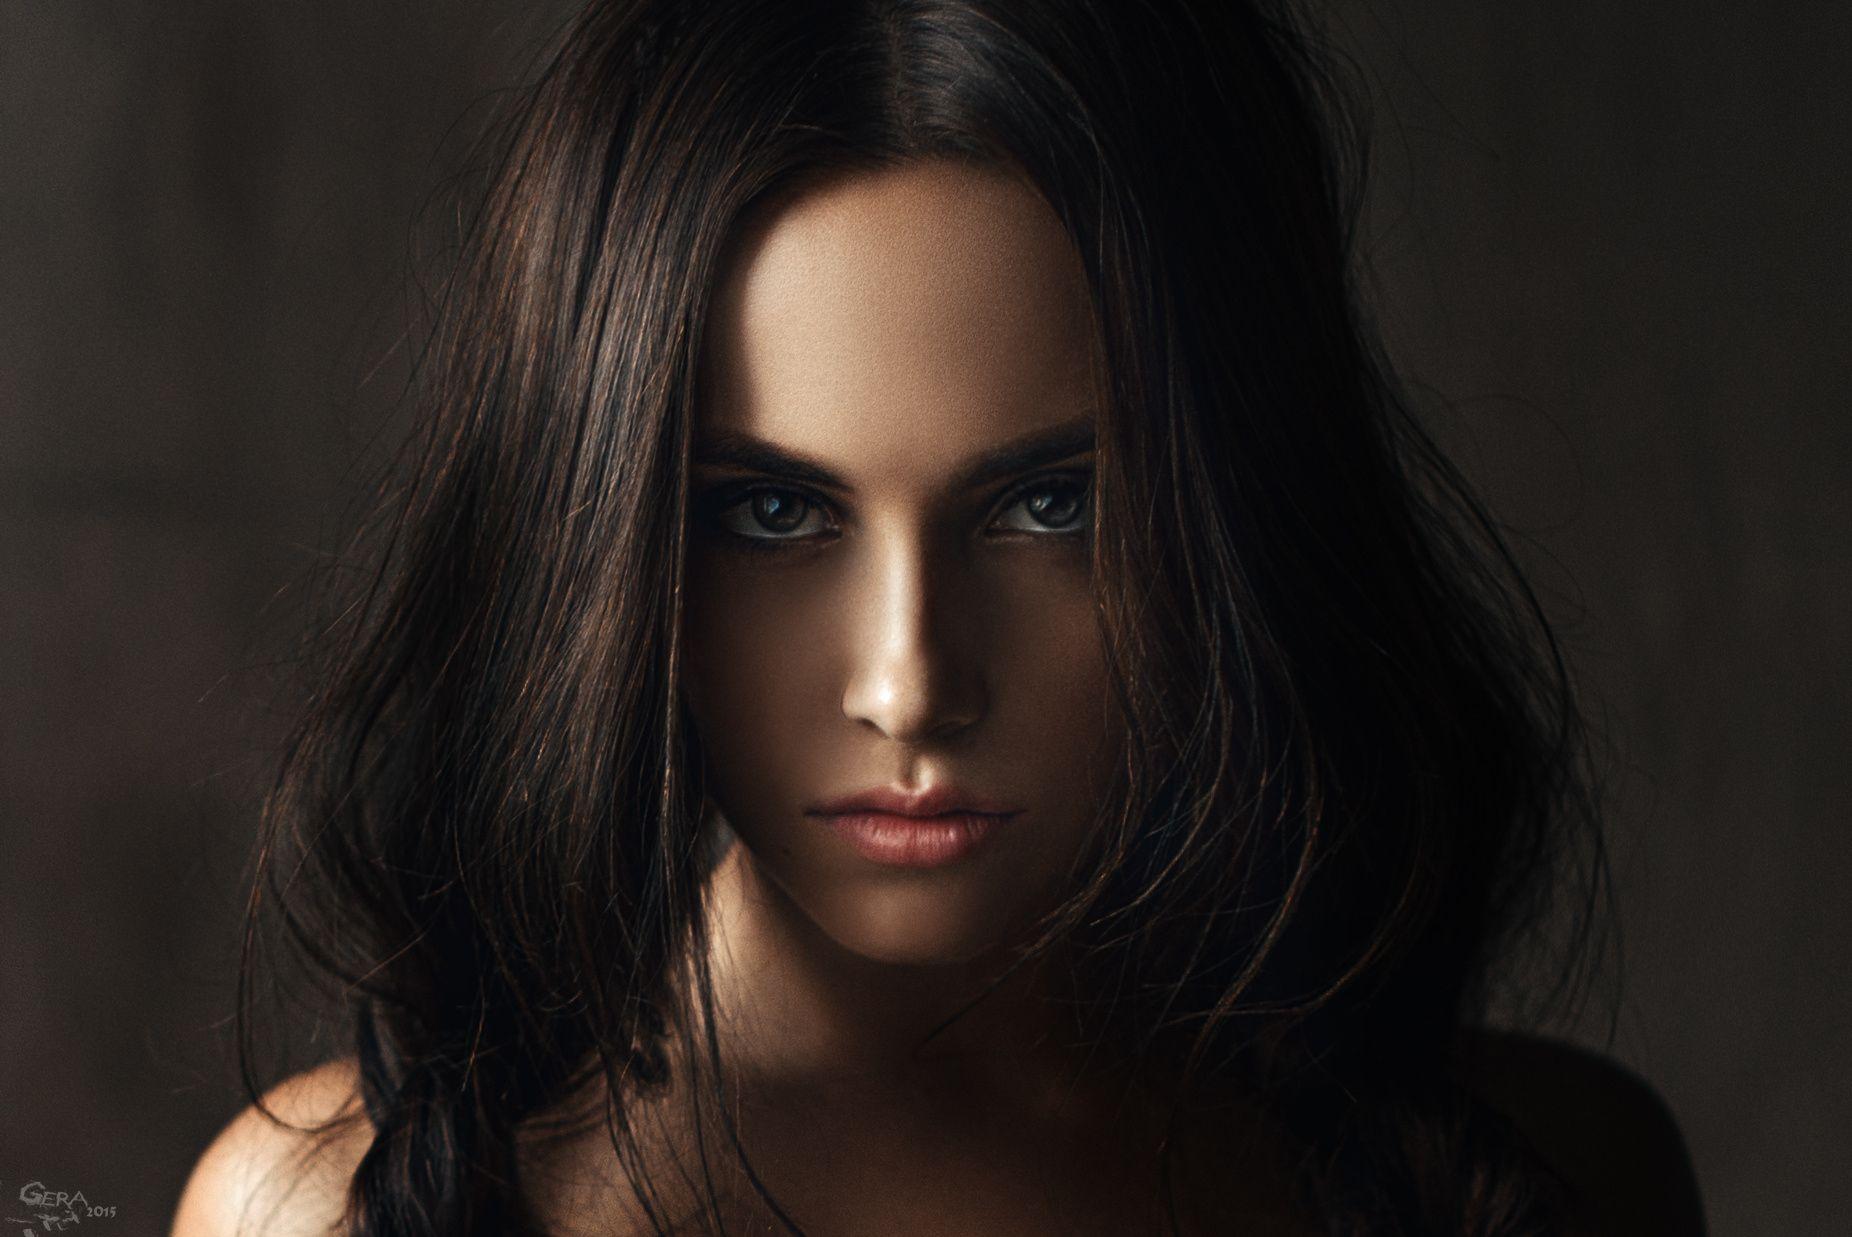 Photograph The offended girl by Георгий  Чернядьев (Georgiy Chernyadyev) on 500px